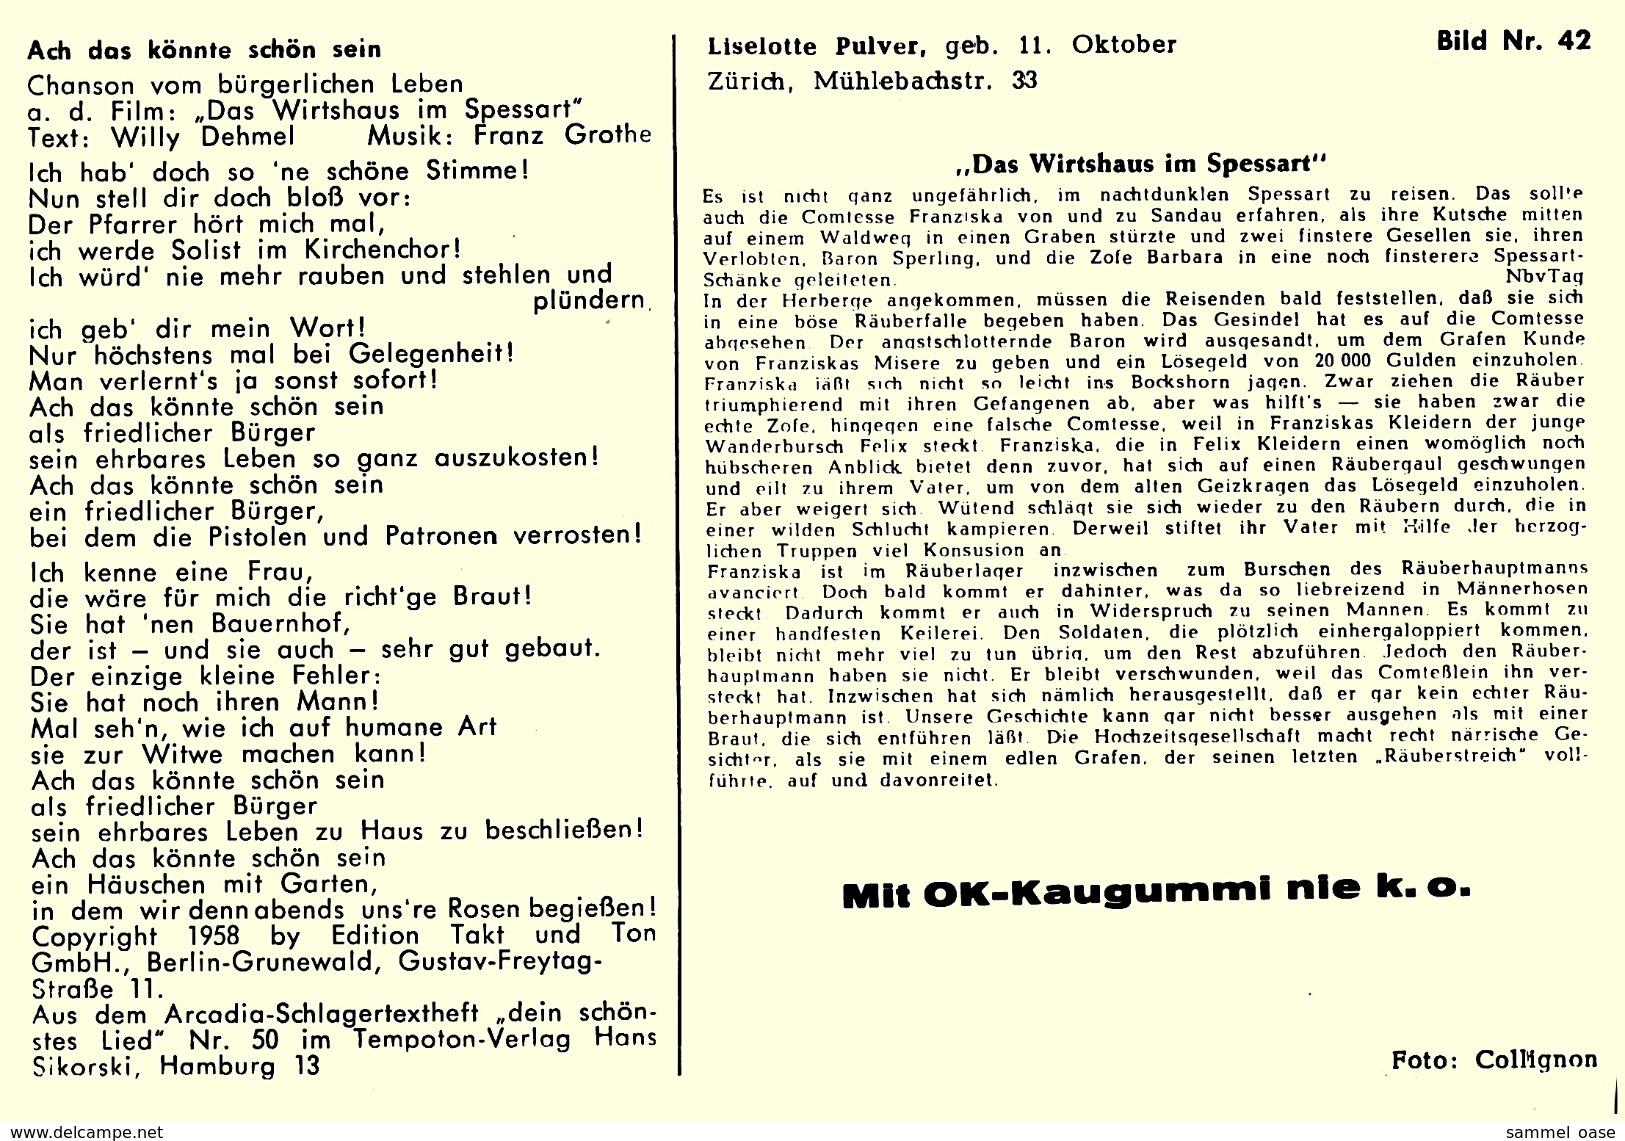 Ca. 1958  -  Sammelbild OK-Kaugummi  -  Liselotte Pulver  -  Bild Nr. 42 - Süsswaren